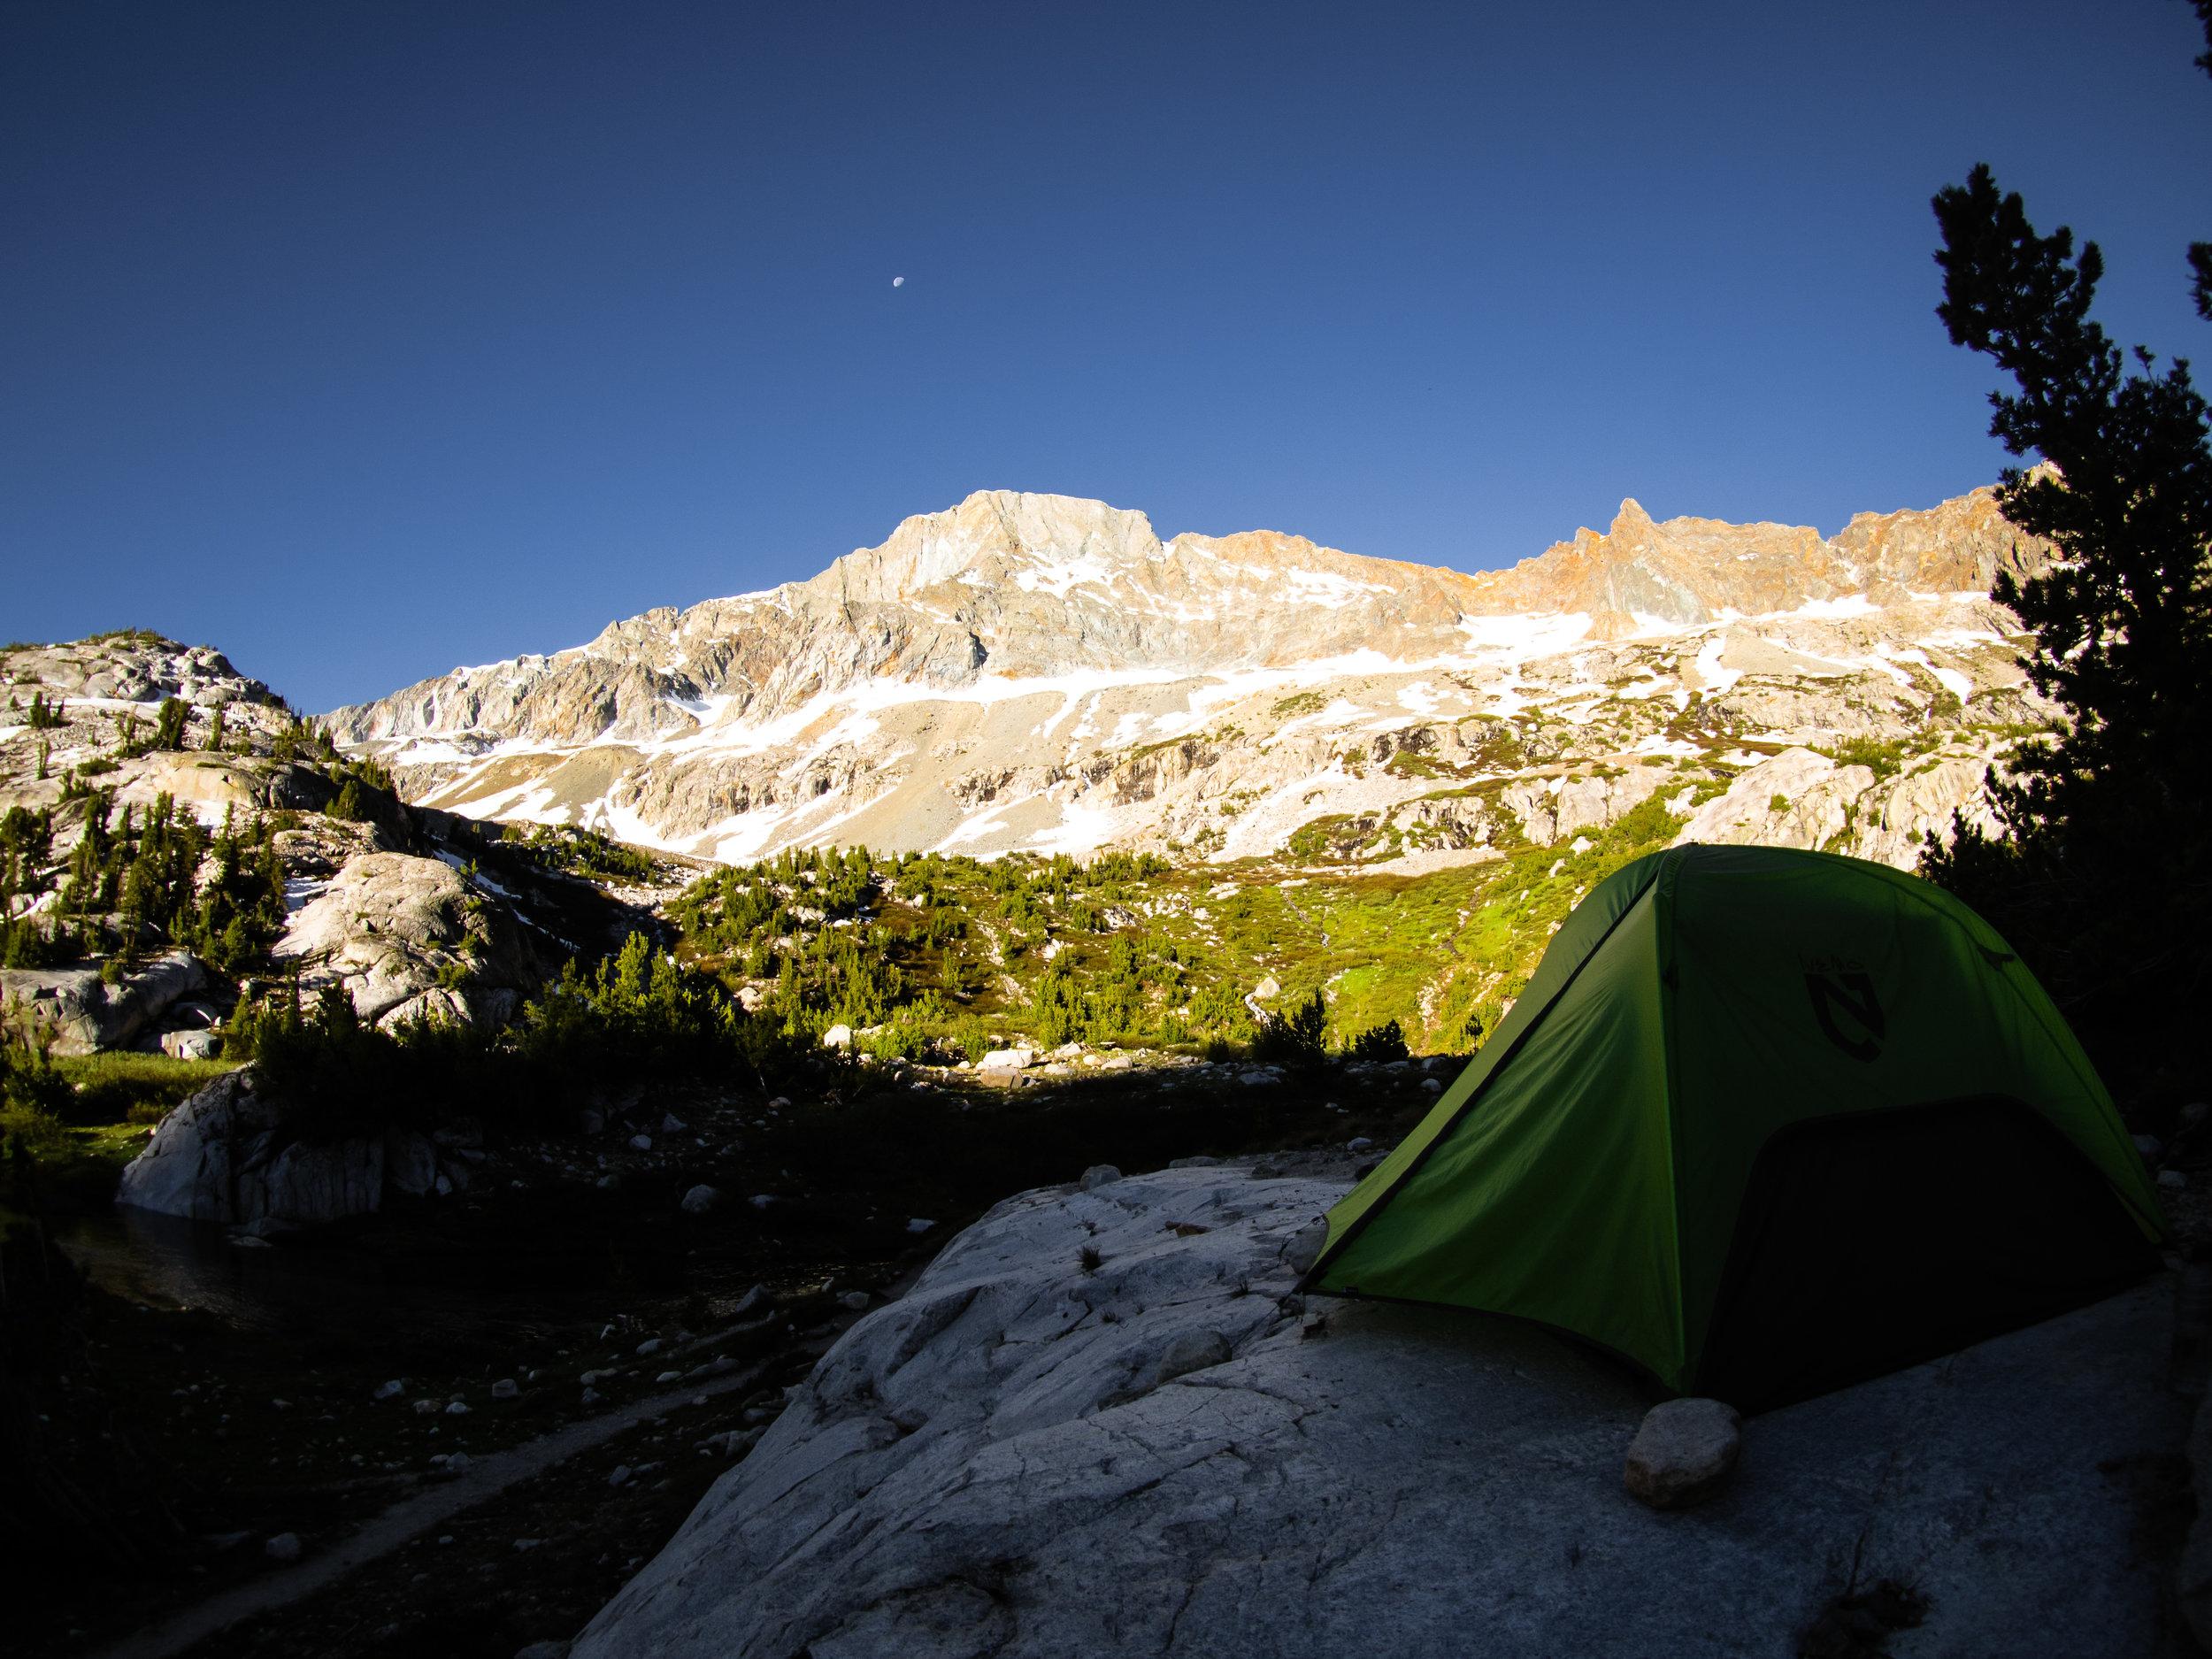 Camping before Muir Pass